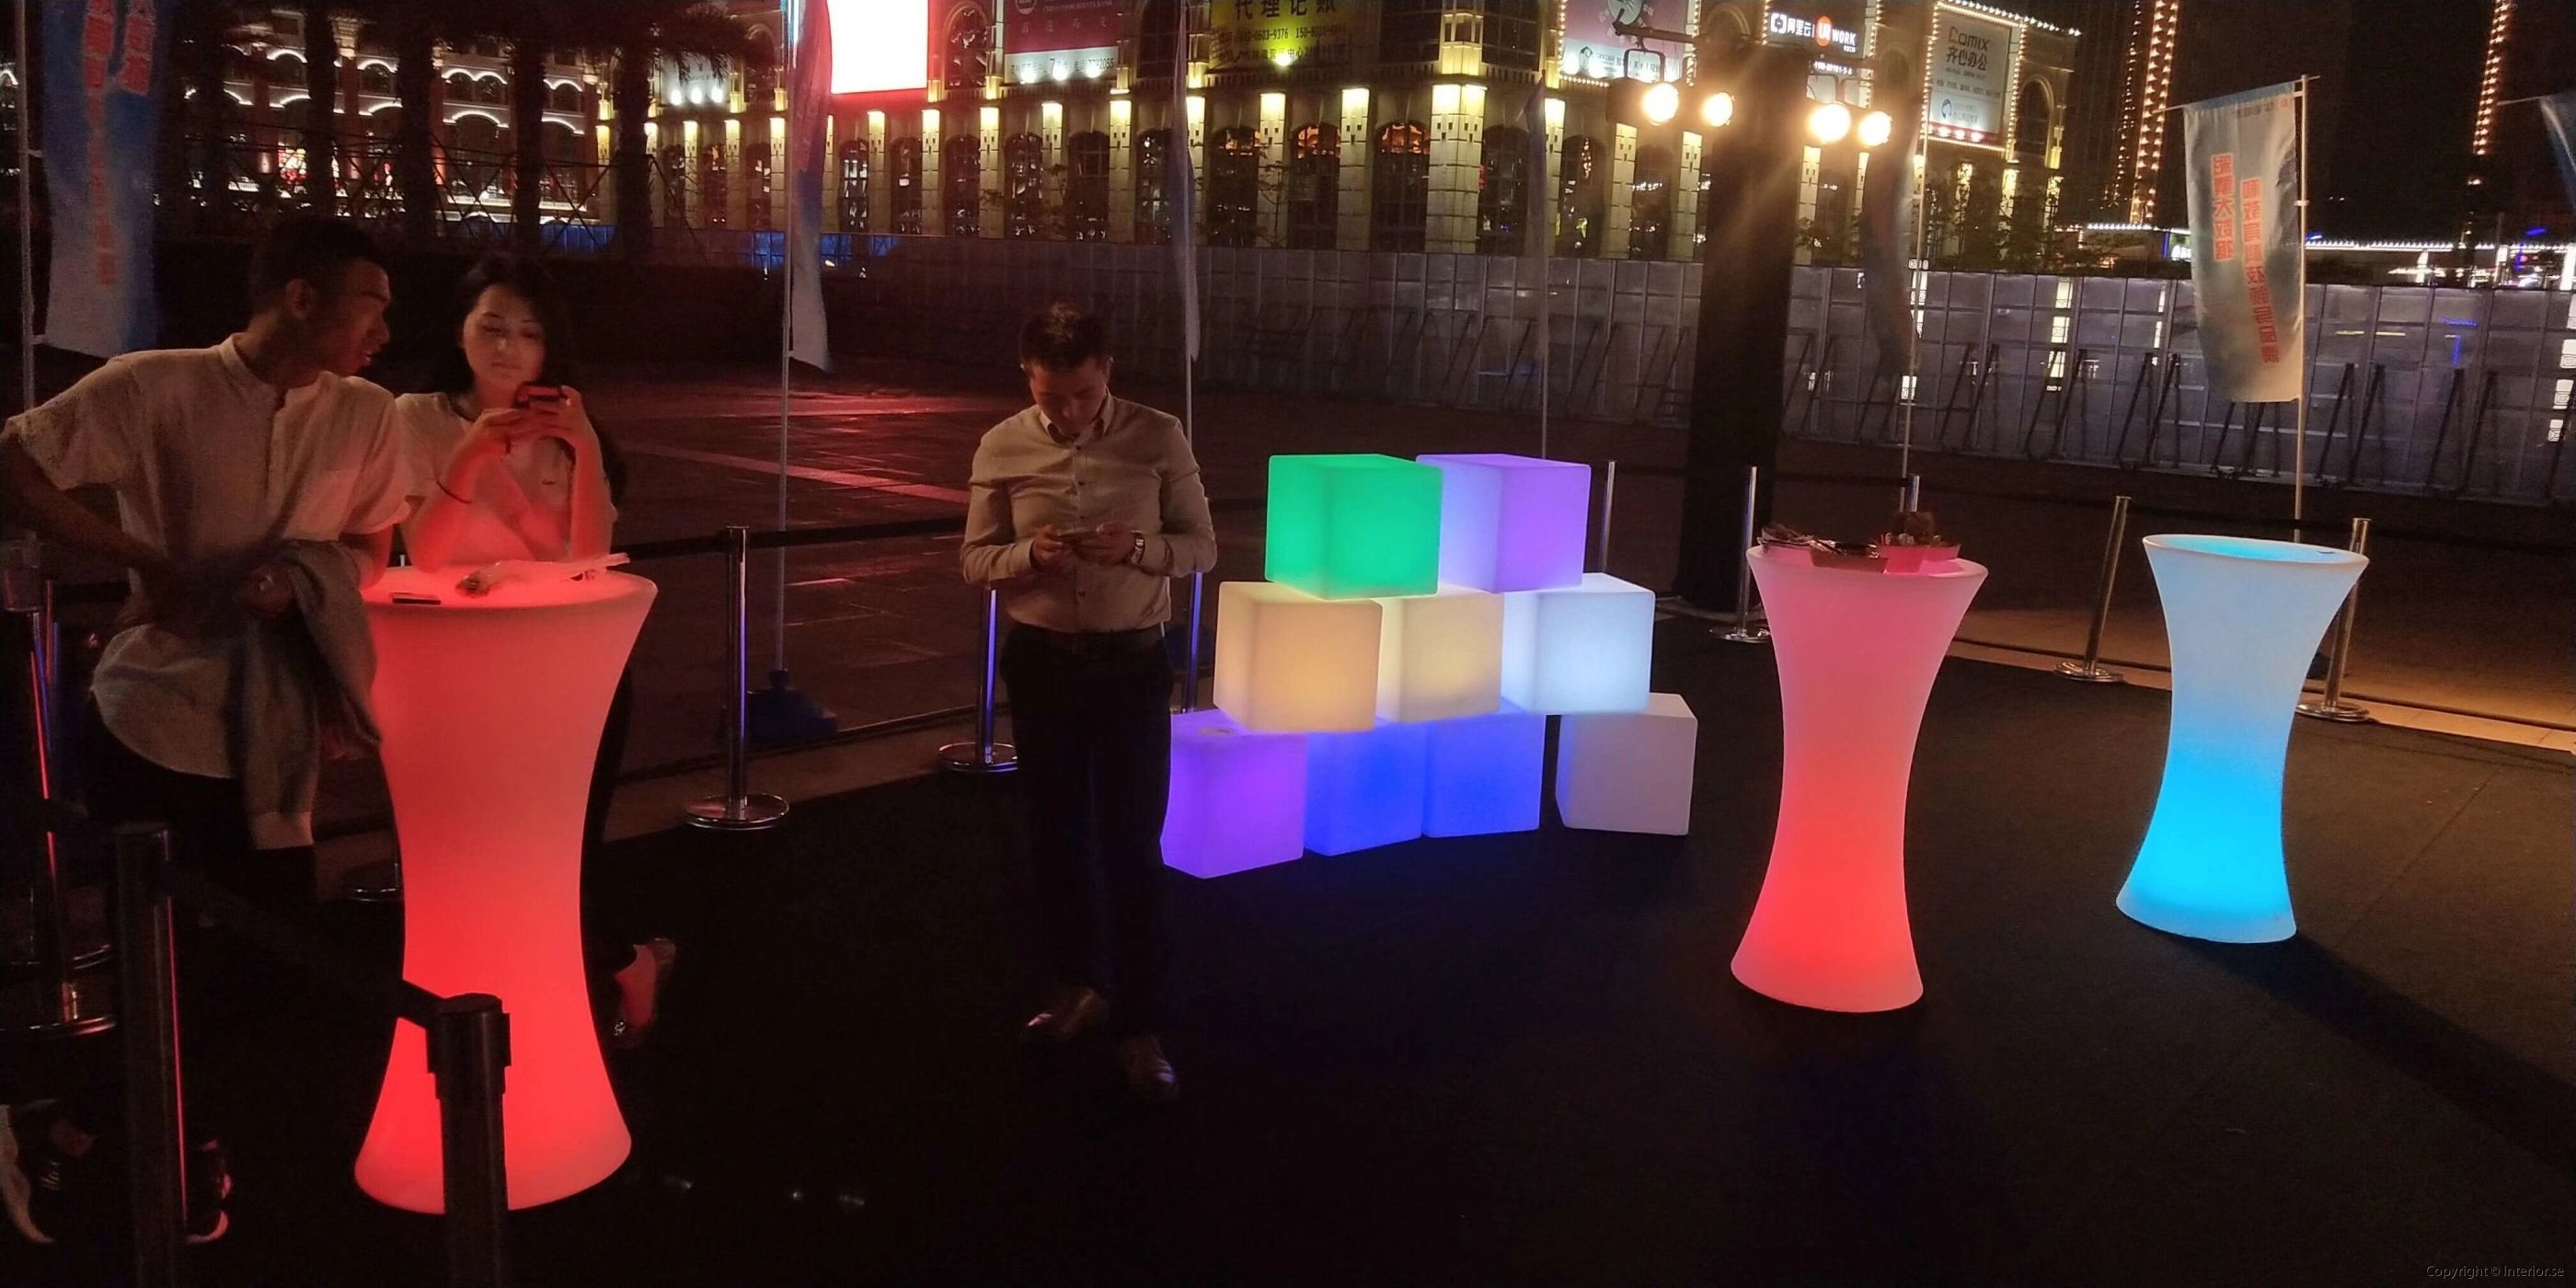 Hyra ståbordbarbord - RGB LED Uppladdsningsbar